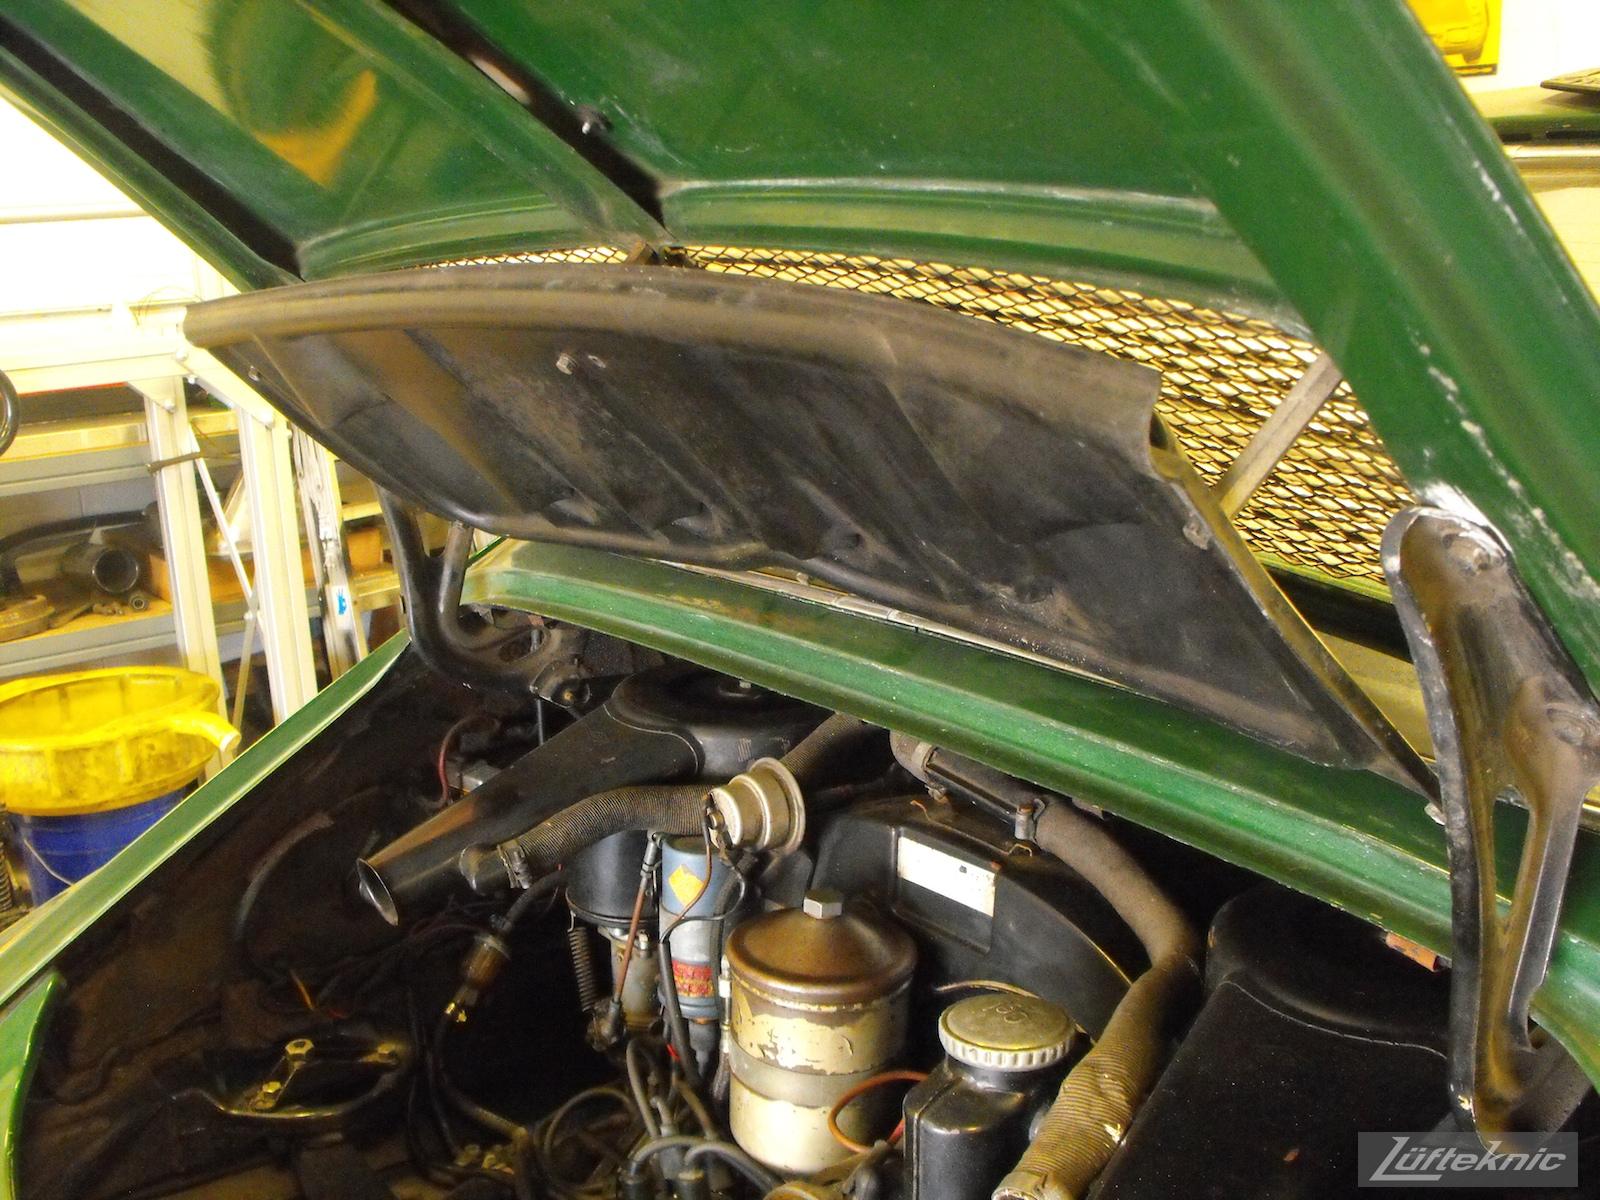 An engine decklid close up of an Irish Green Porsche 912 undergoing restoration at Lufteknic.